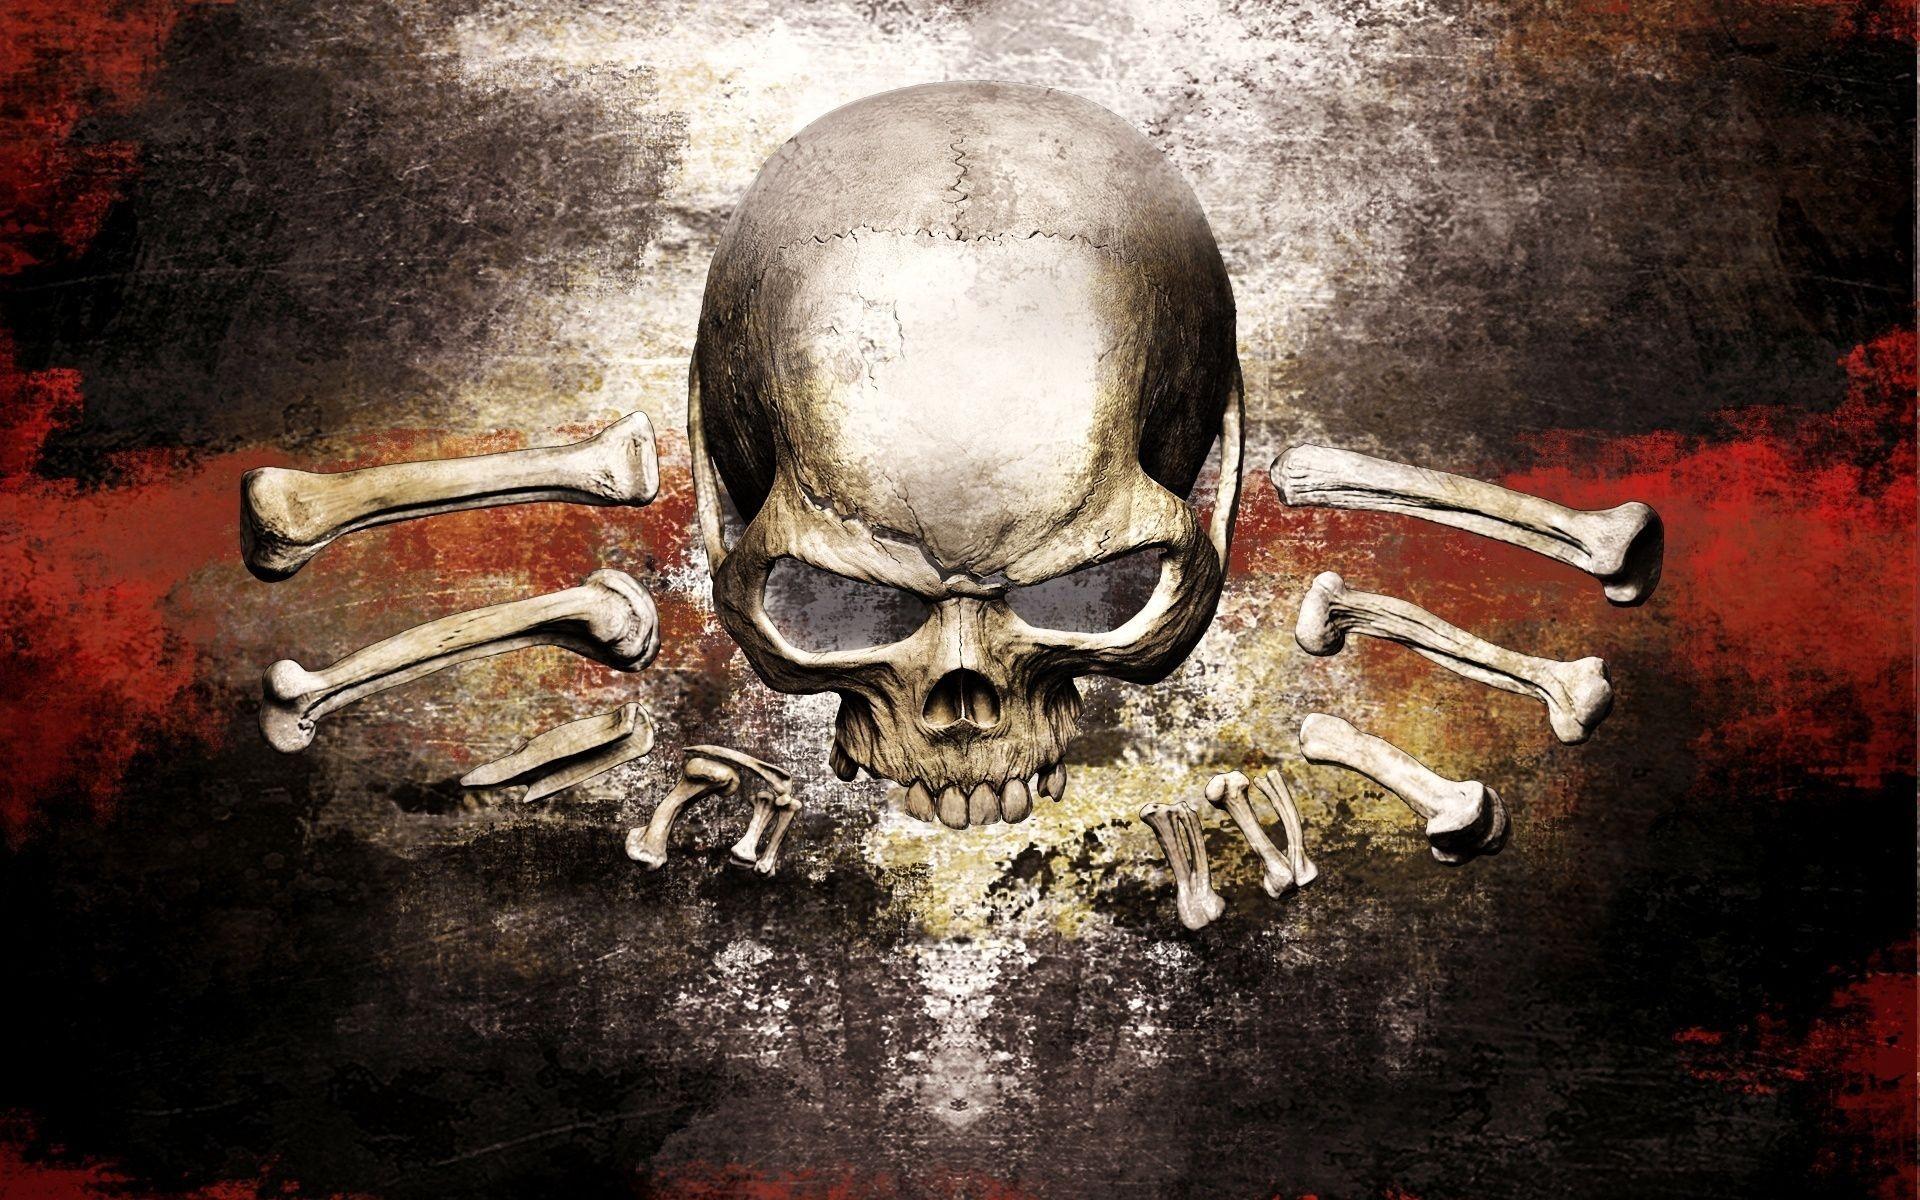 General 1920x1200 Risen 2 video games RPG skull